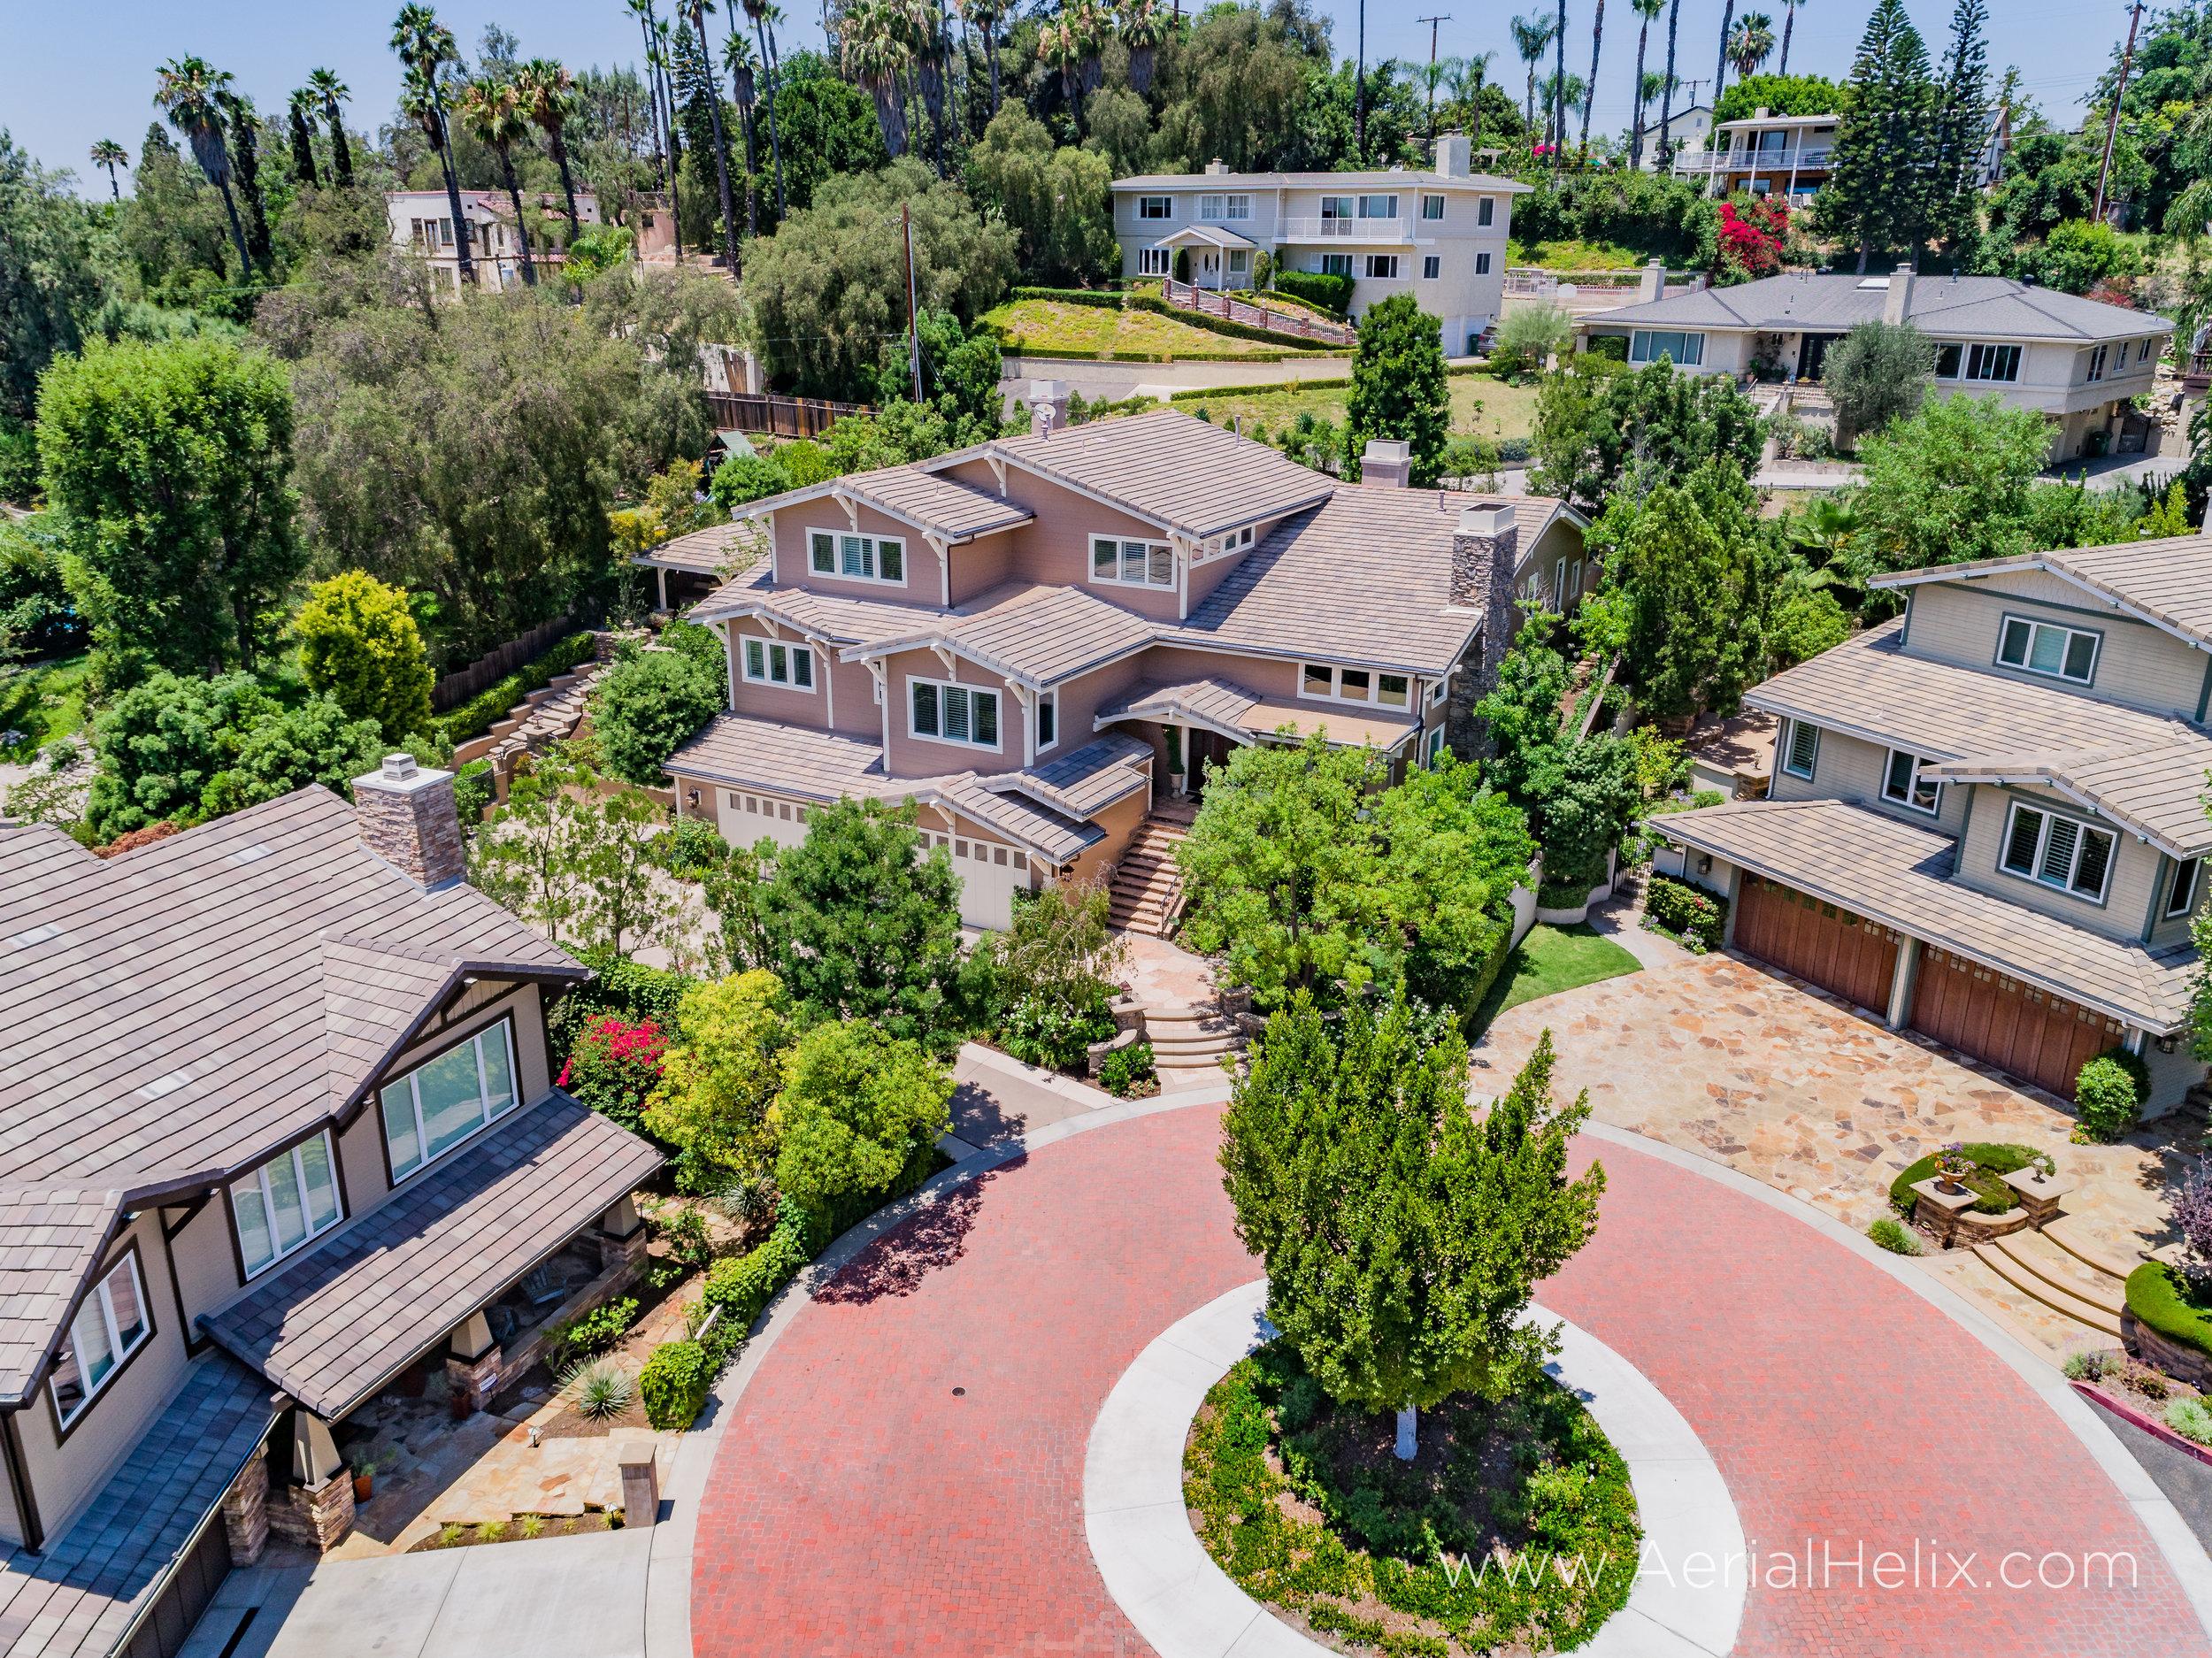 HELIX - Craftsman Lane - Real Estate Drone Photographer-8.jpg